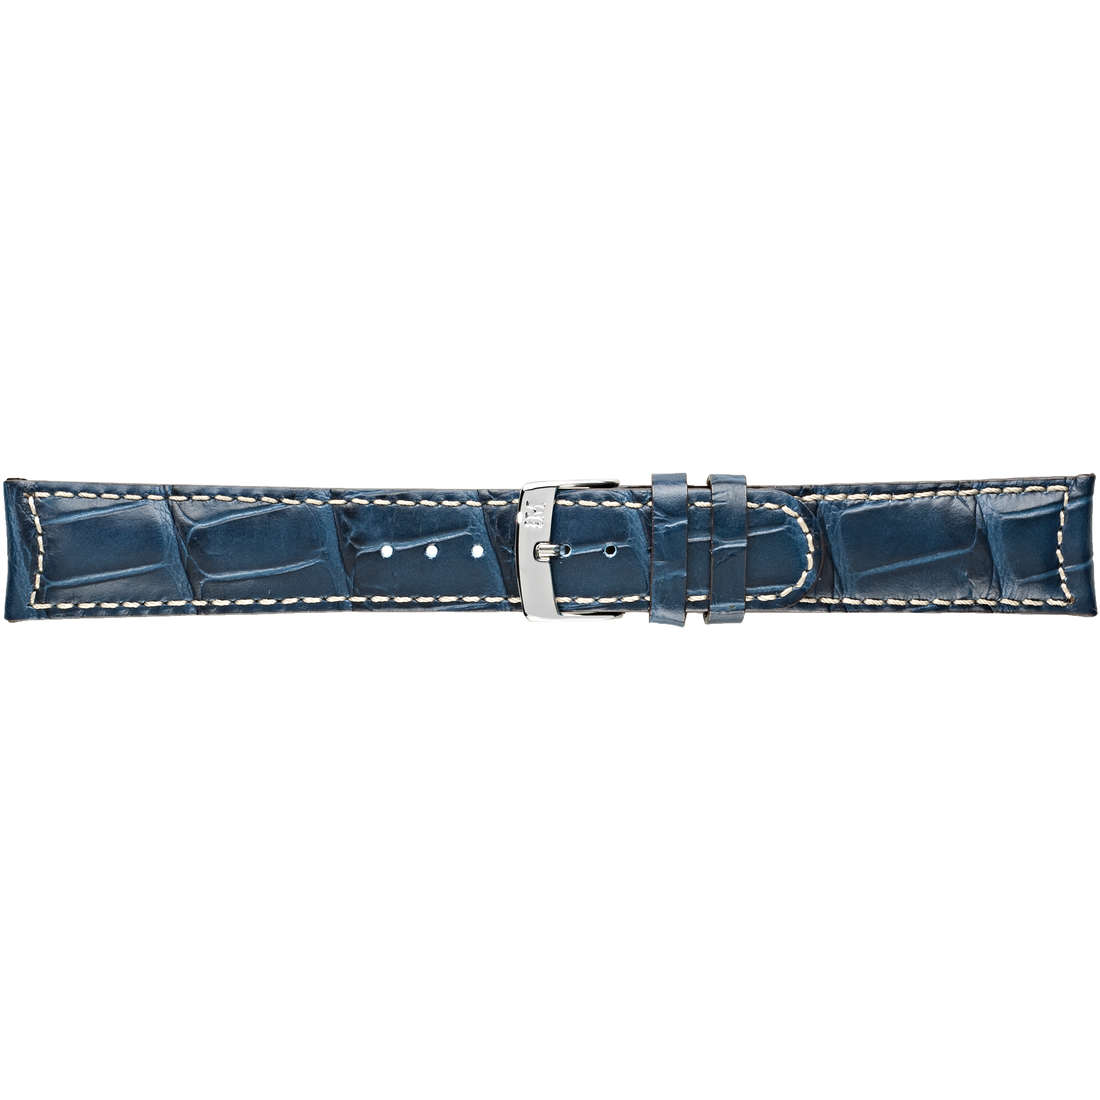 watch watch bands watch straps man Morellato Manufatti A01U3882A59064CR24